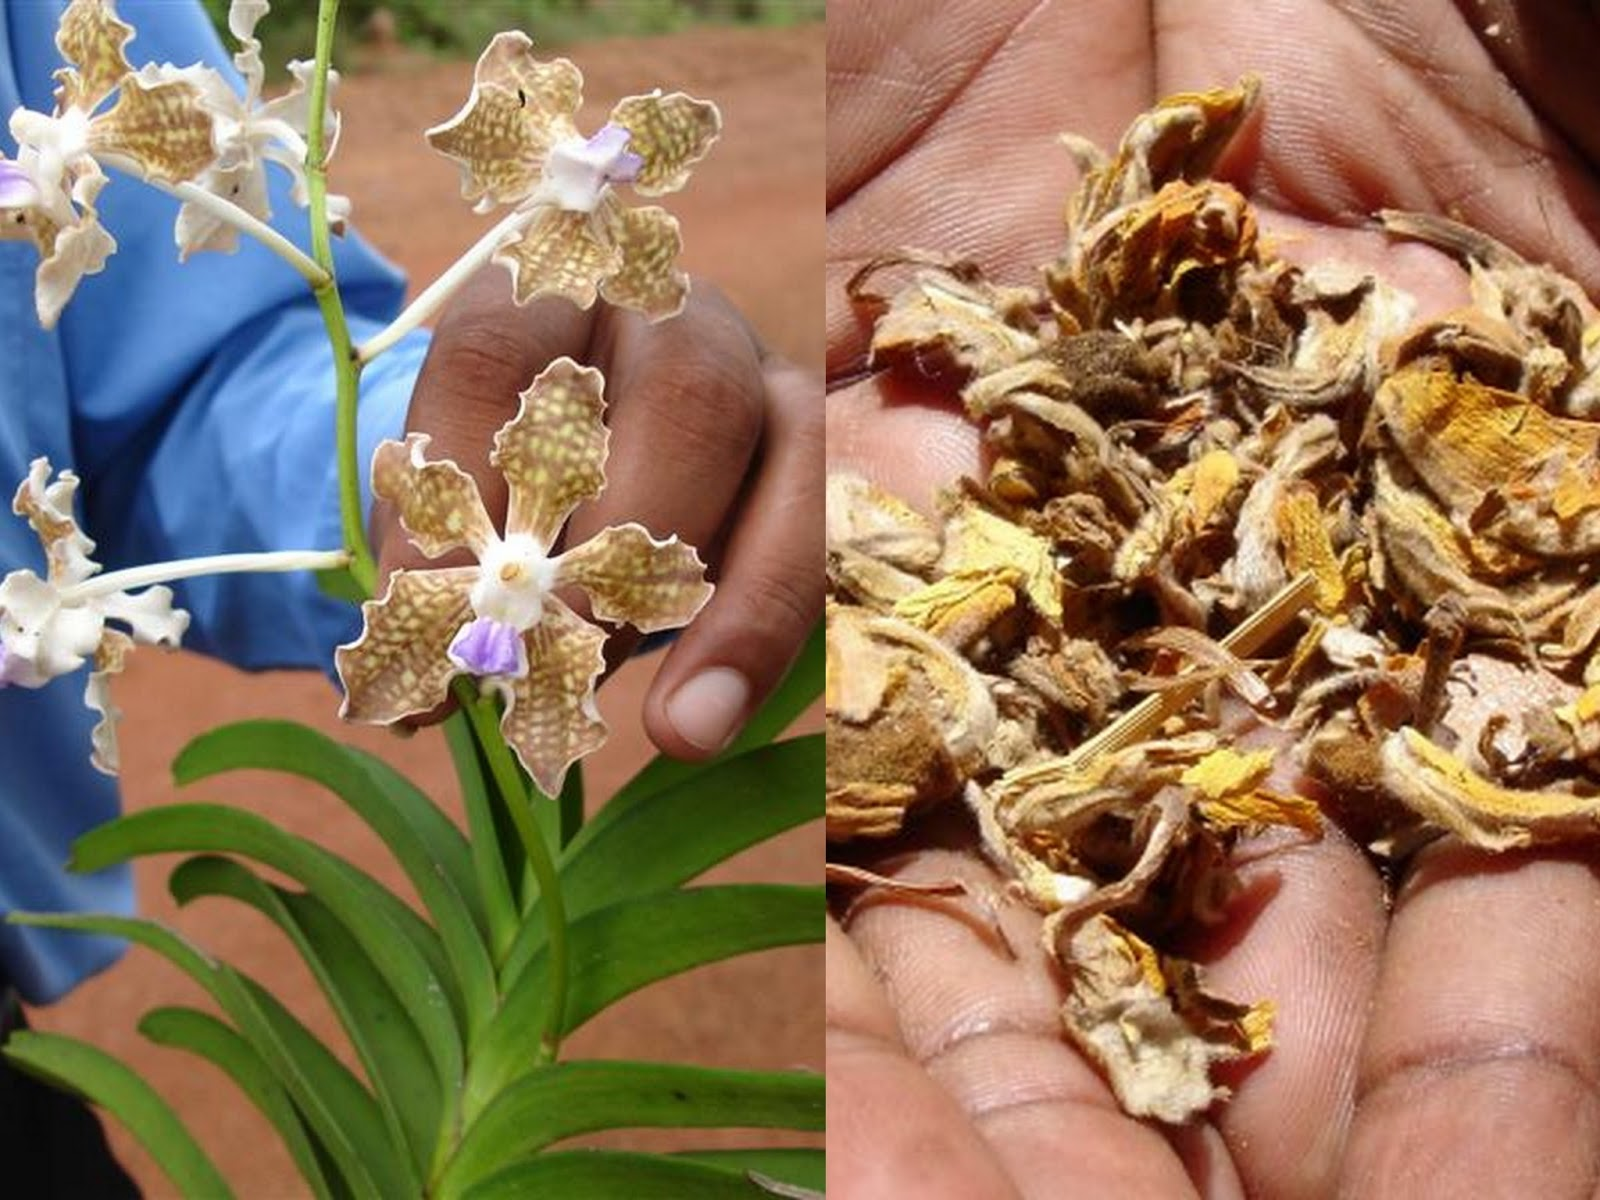 essay on medicinal plants essay on medicinal plants